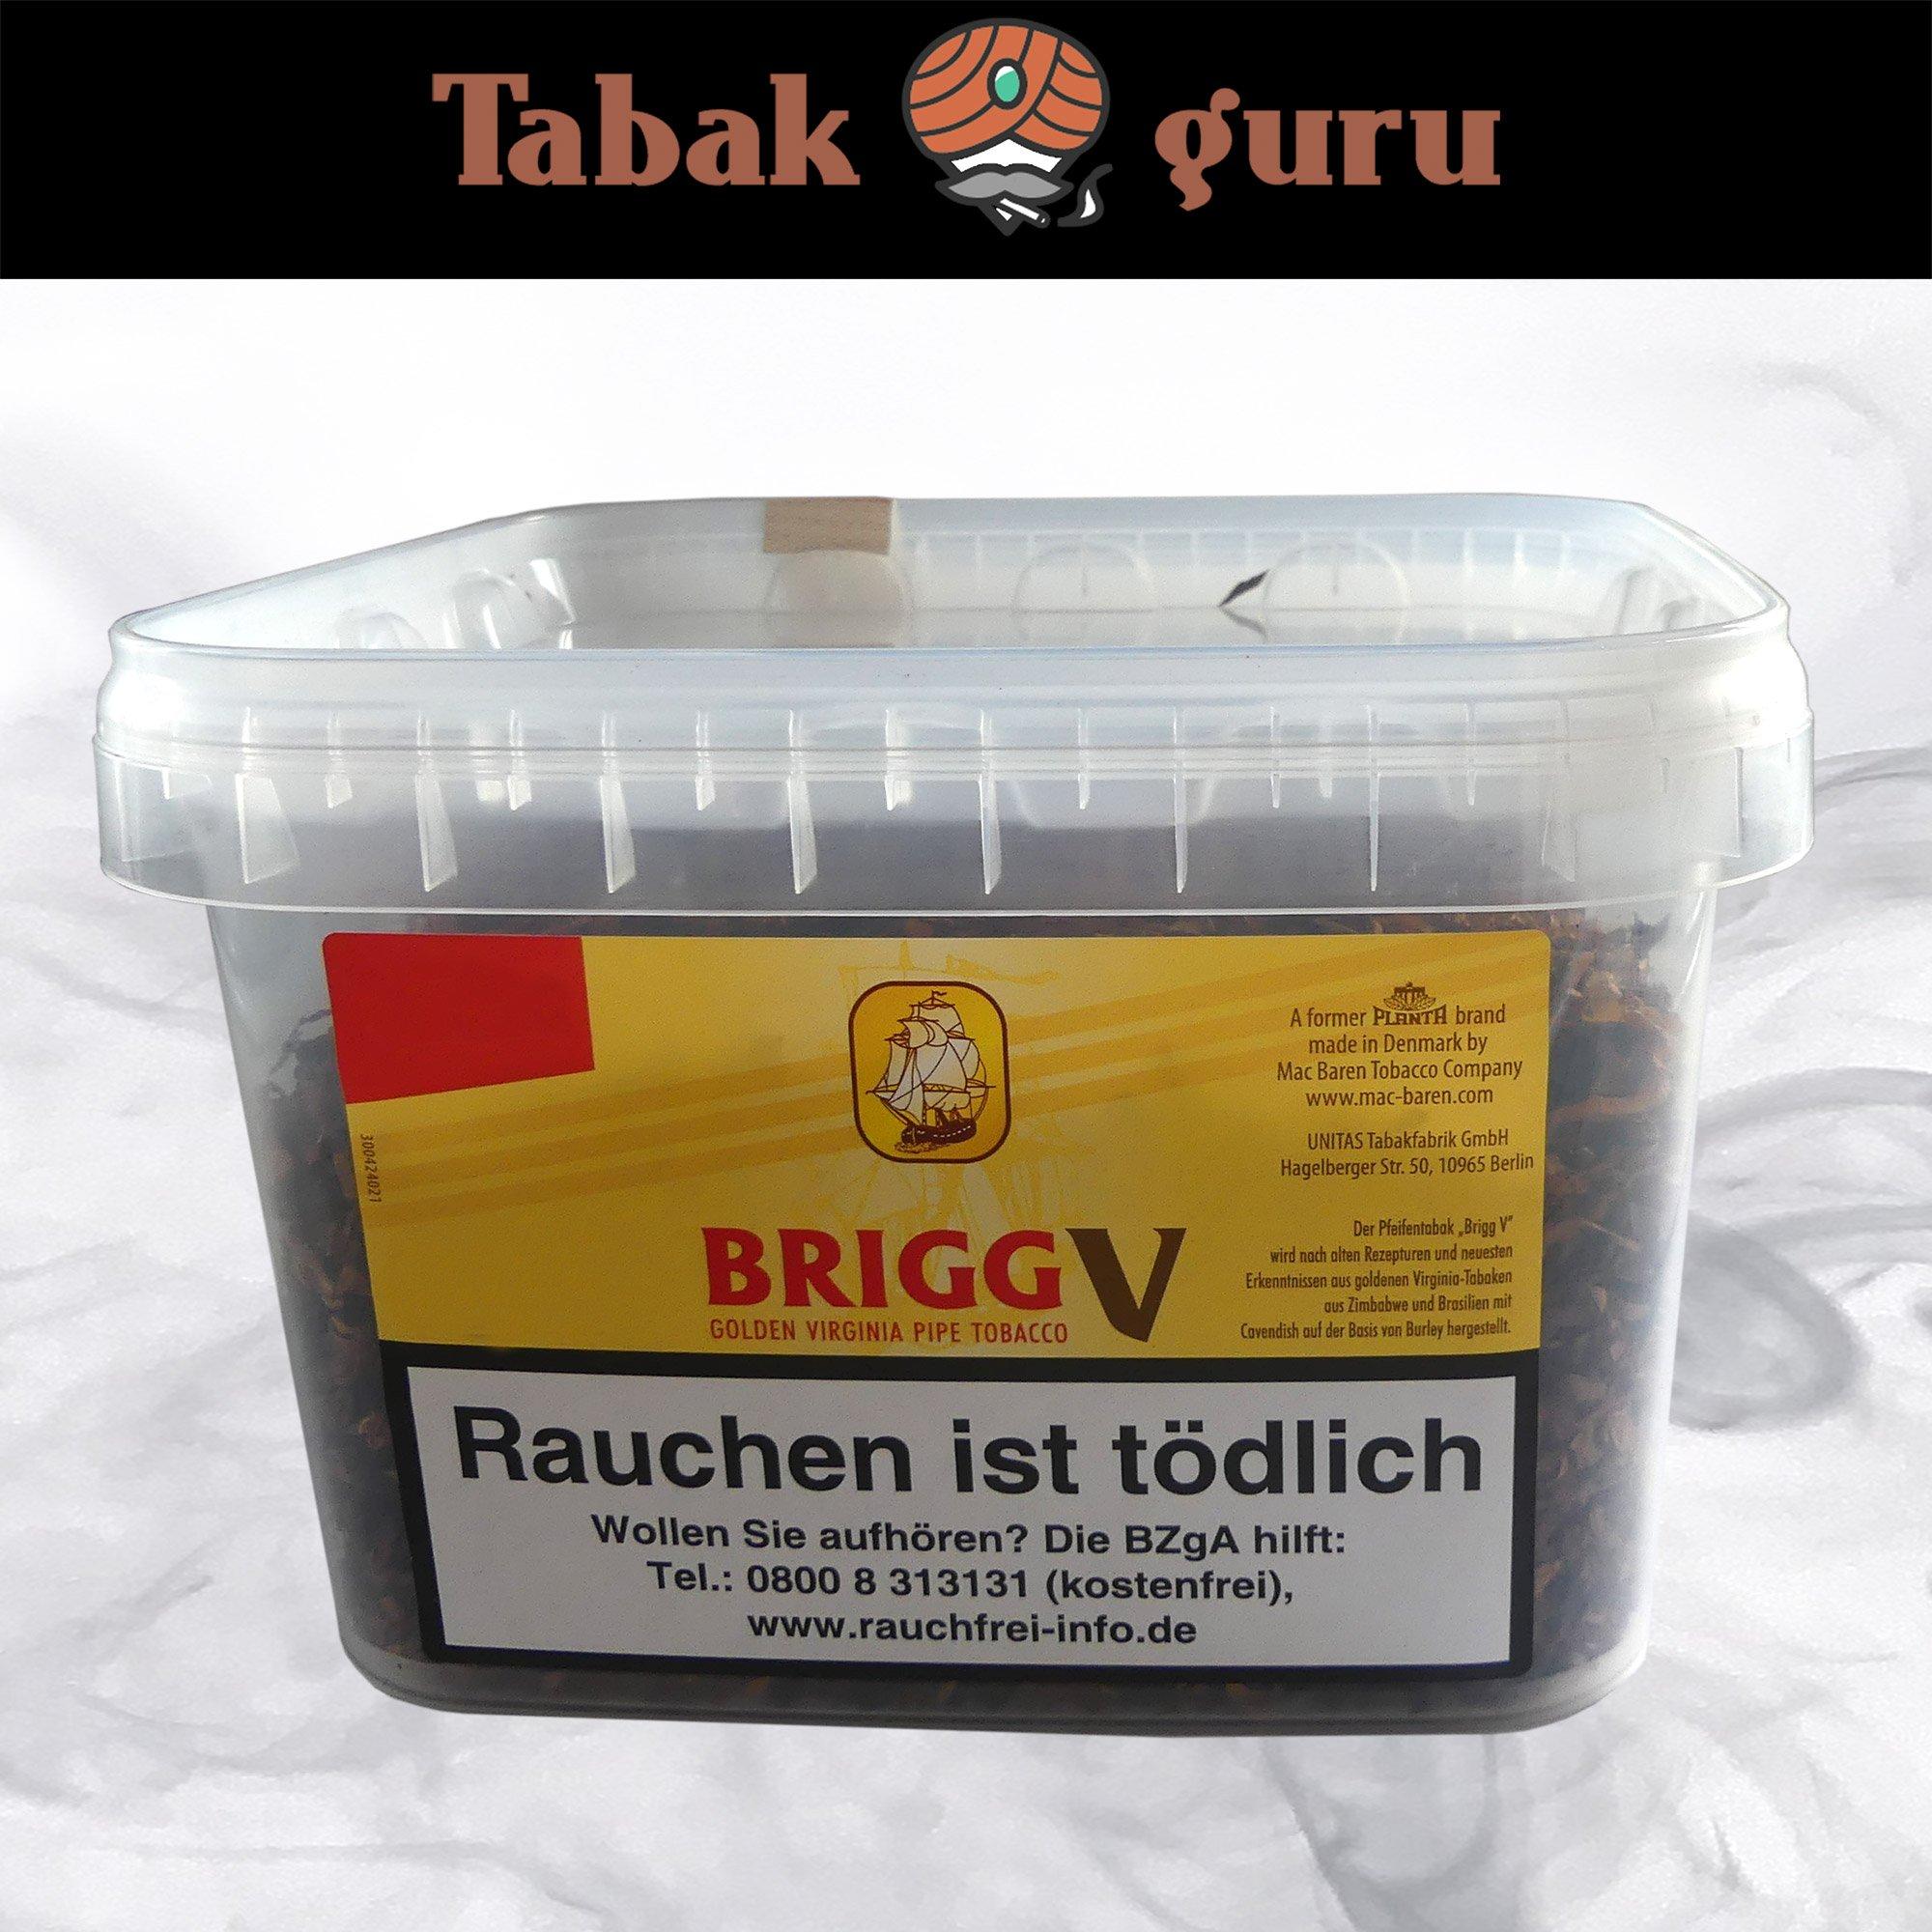 Brigg V Pfeifentabak im 400g Eimer Golden Virginia Tabak mit Vanille Aroma